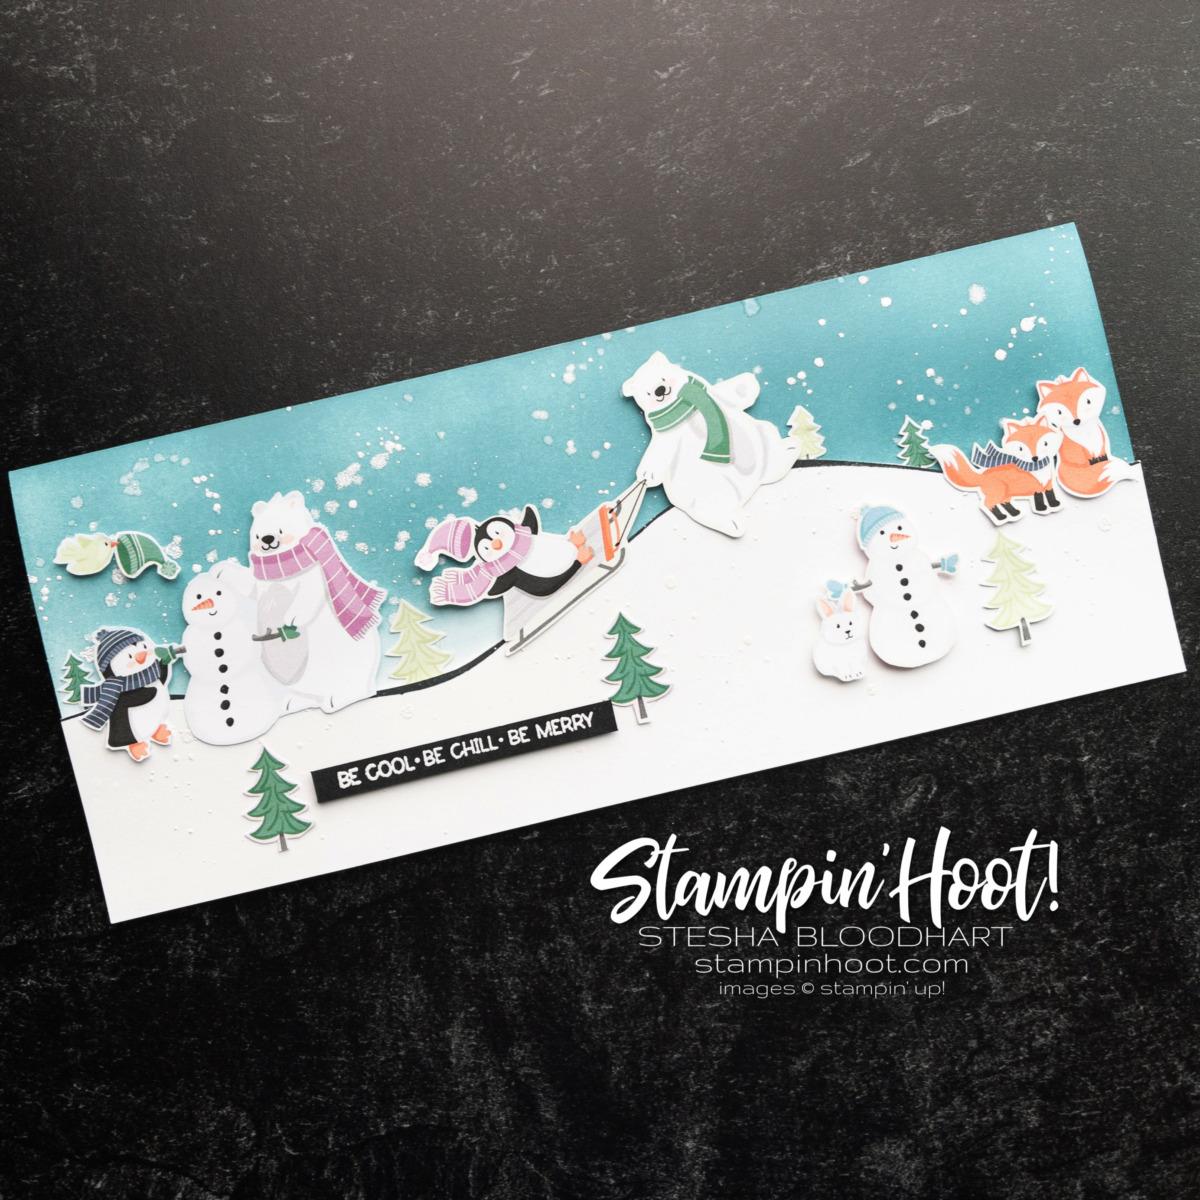 #tgifc326 Decorated Envelopes Challenge Card Slimline Card by Stesha Bloodhart, Stampin' Hoot!